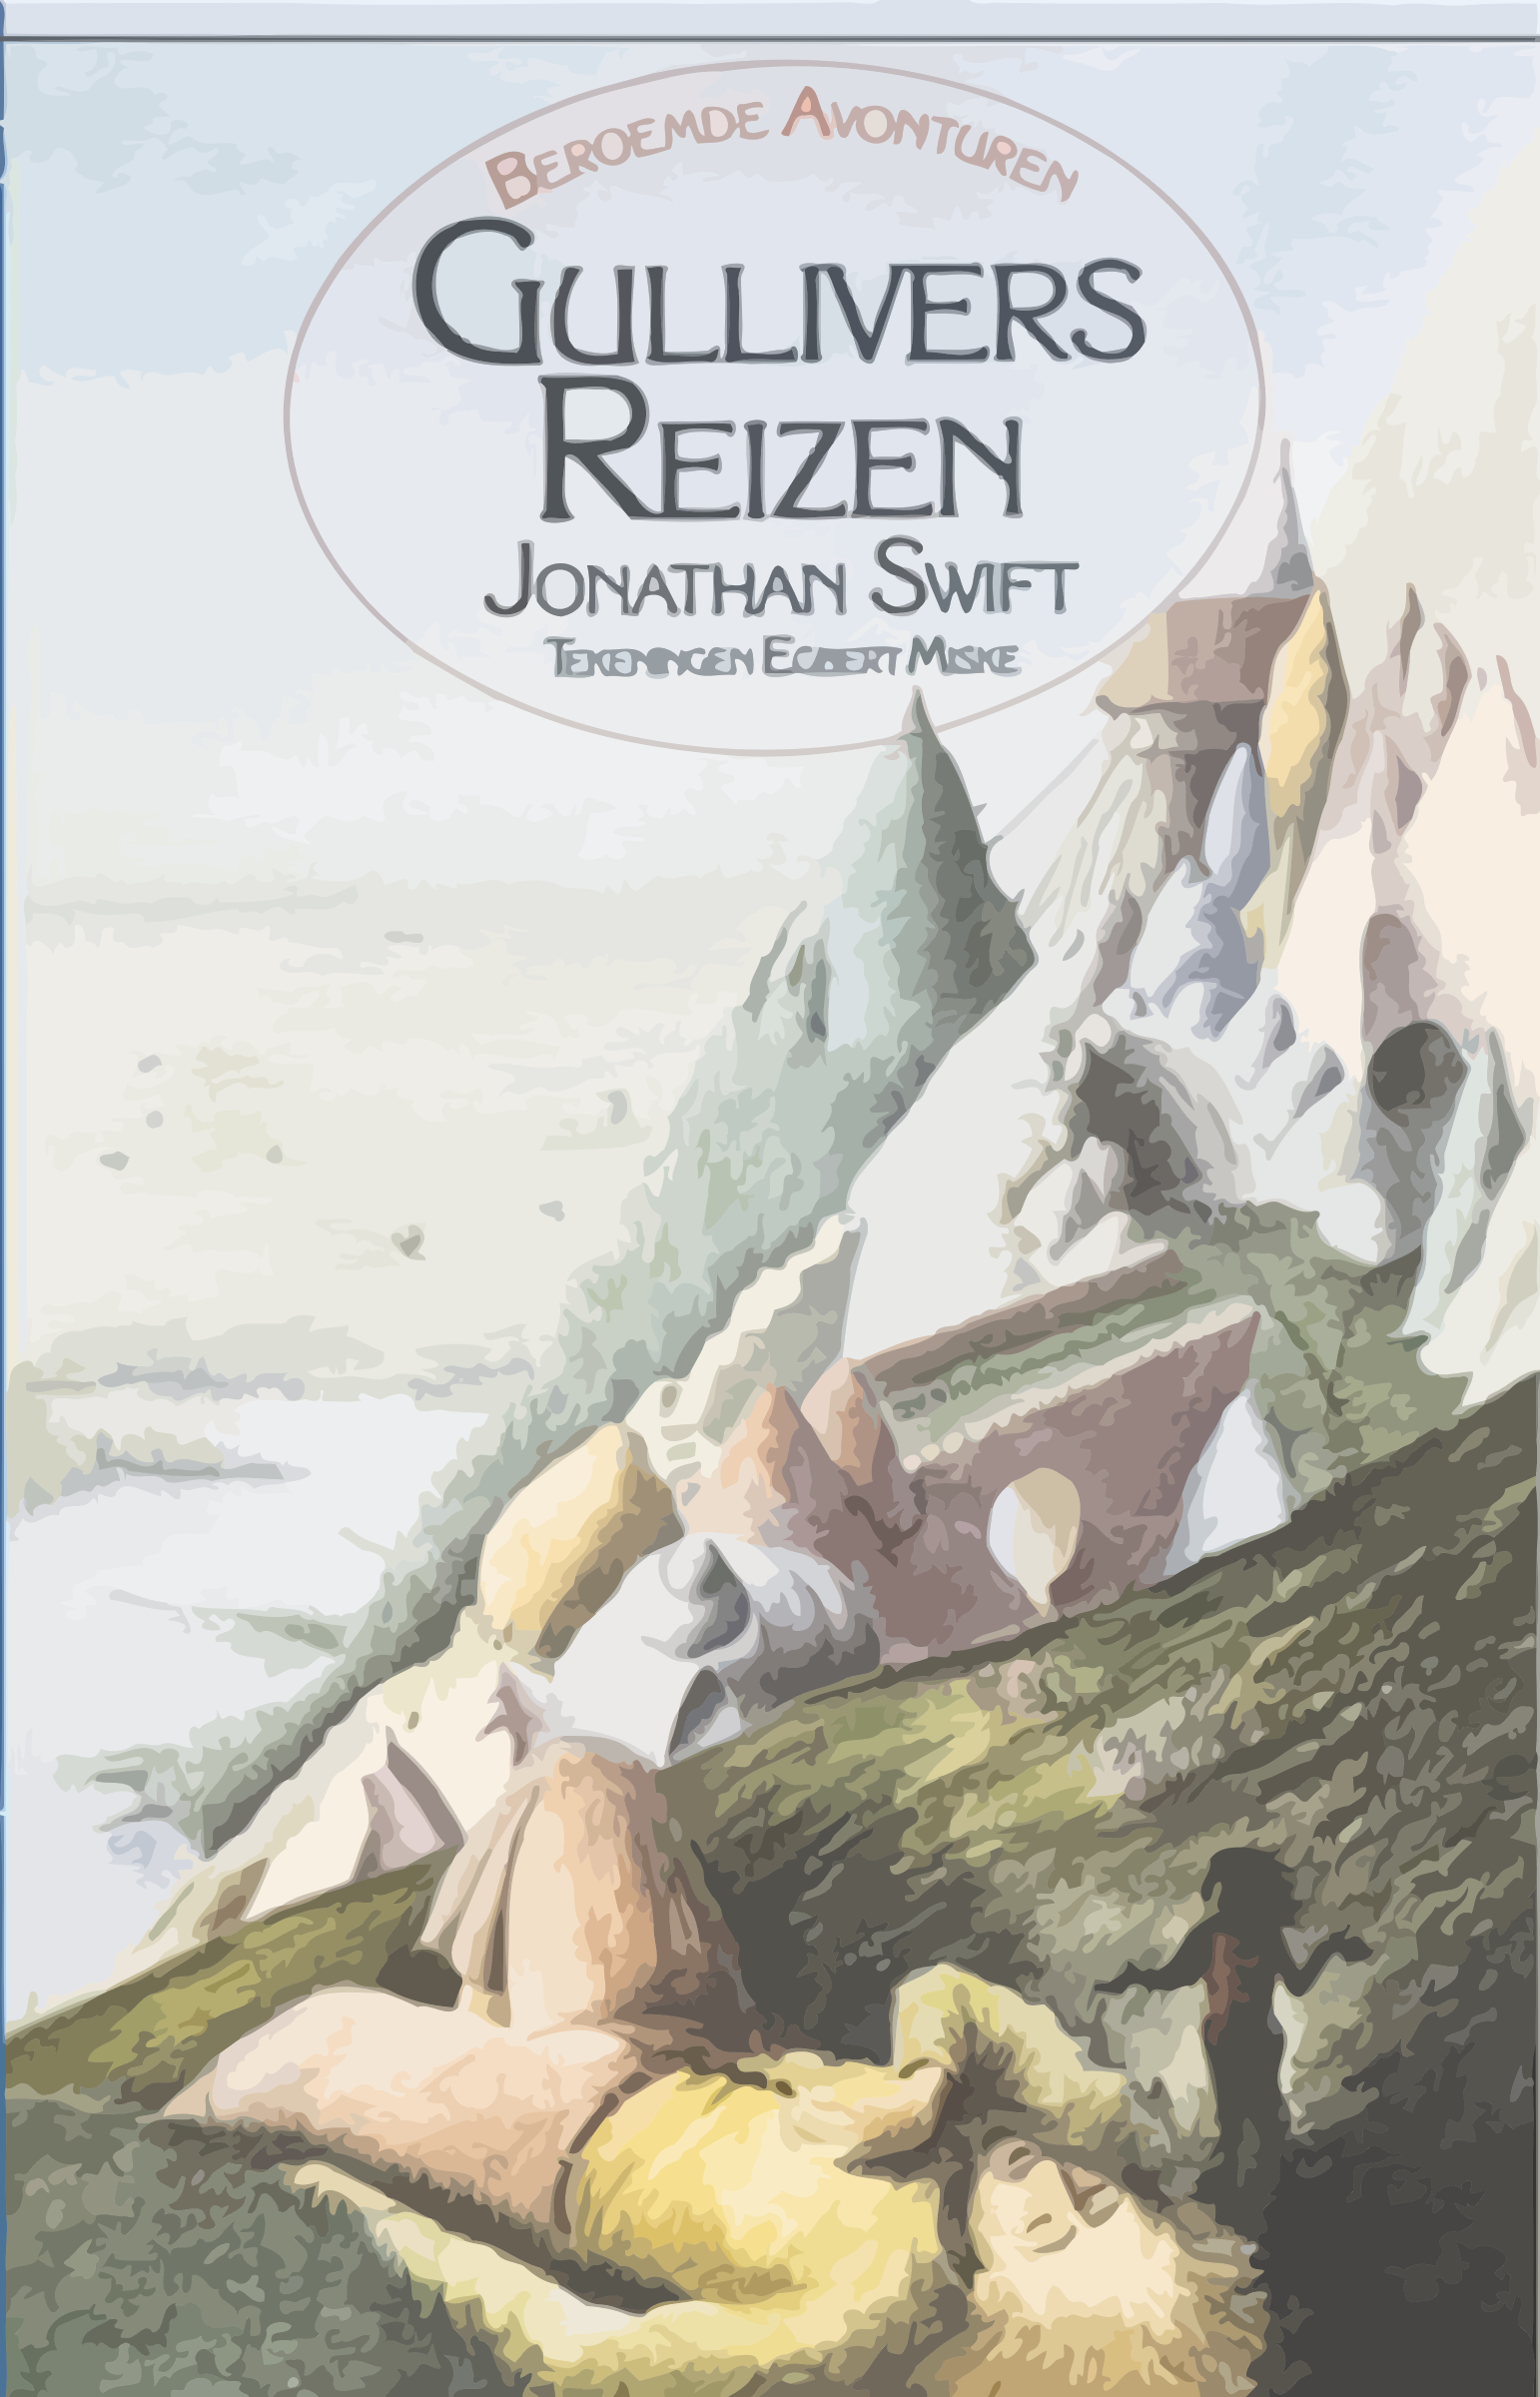 Jonathan Swift – Gulliver's reizen